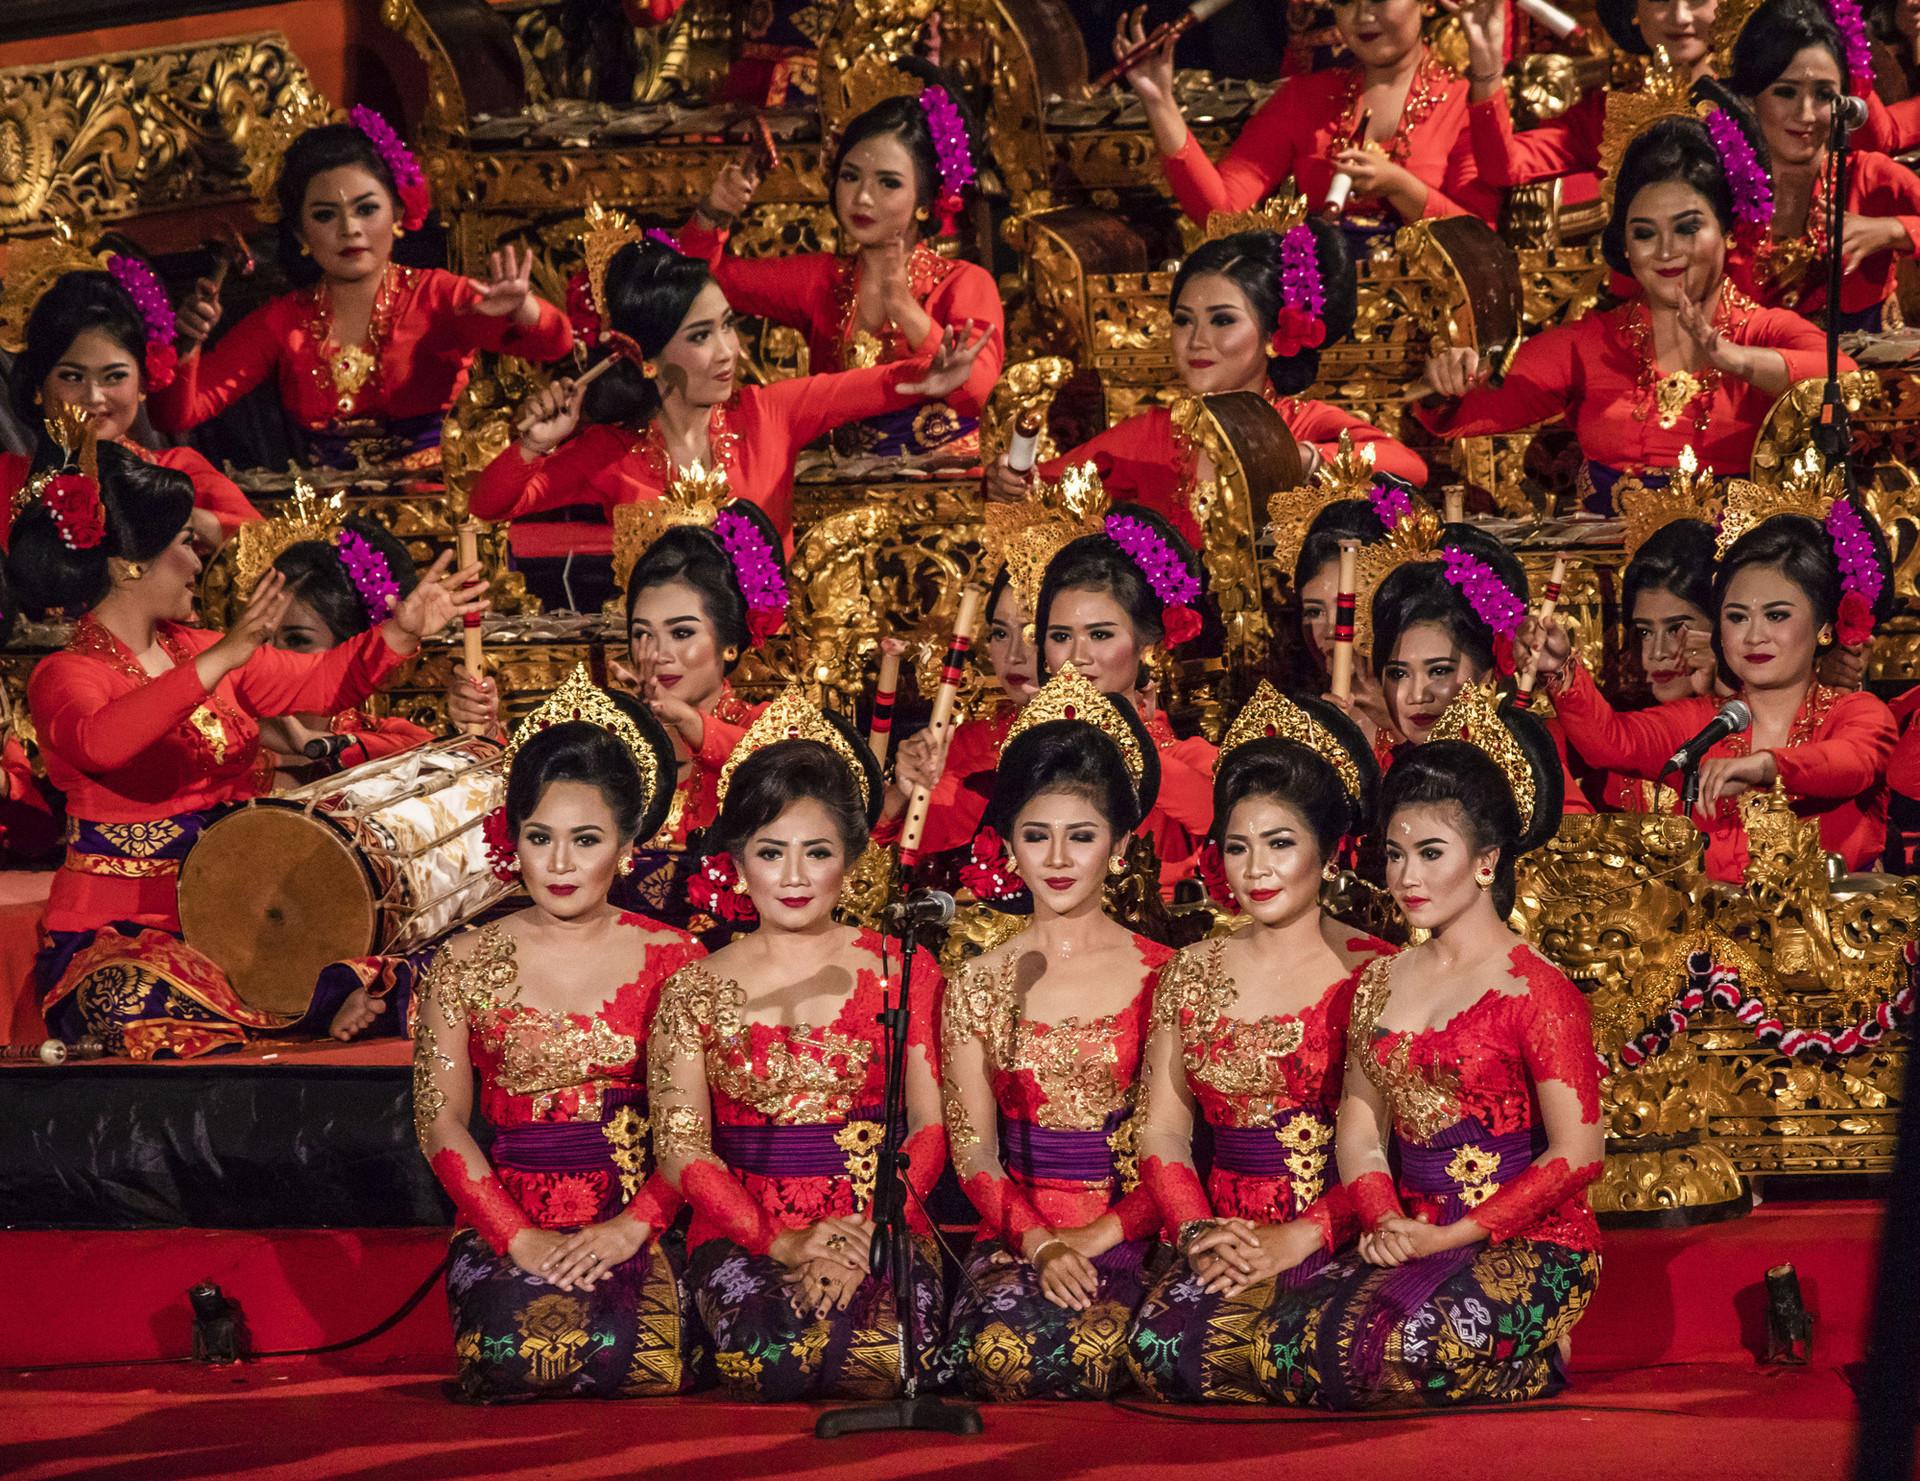 Pertunjukan gamelan perempuan pada acara Bali Art Festival di Pulau Bali.